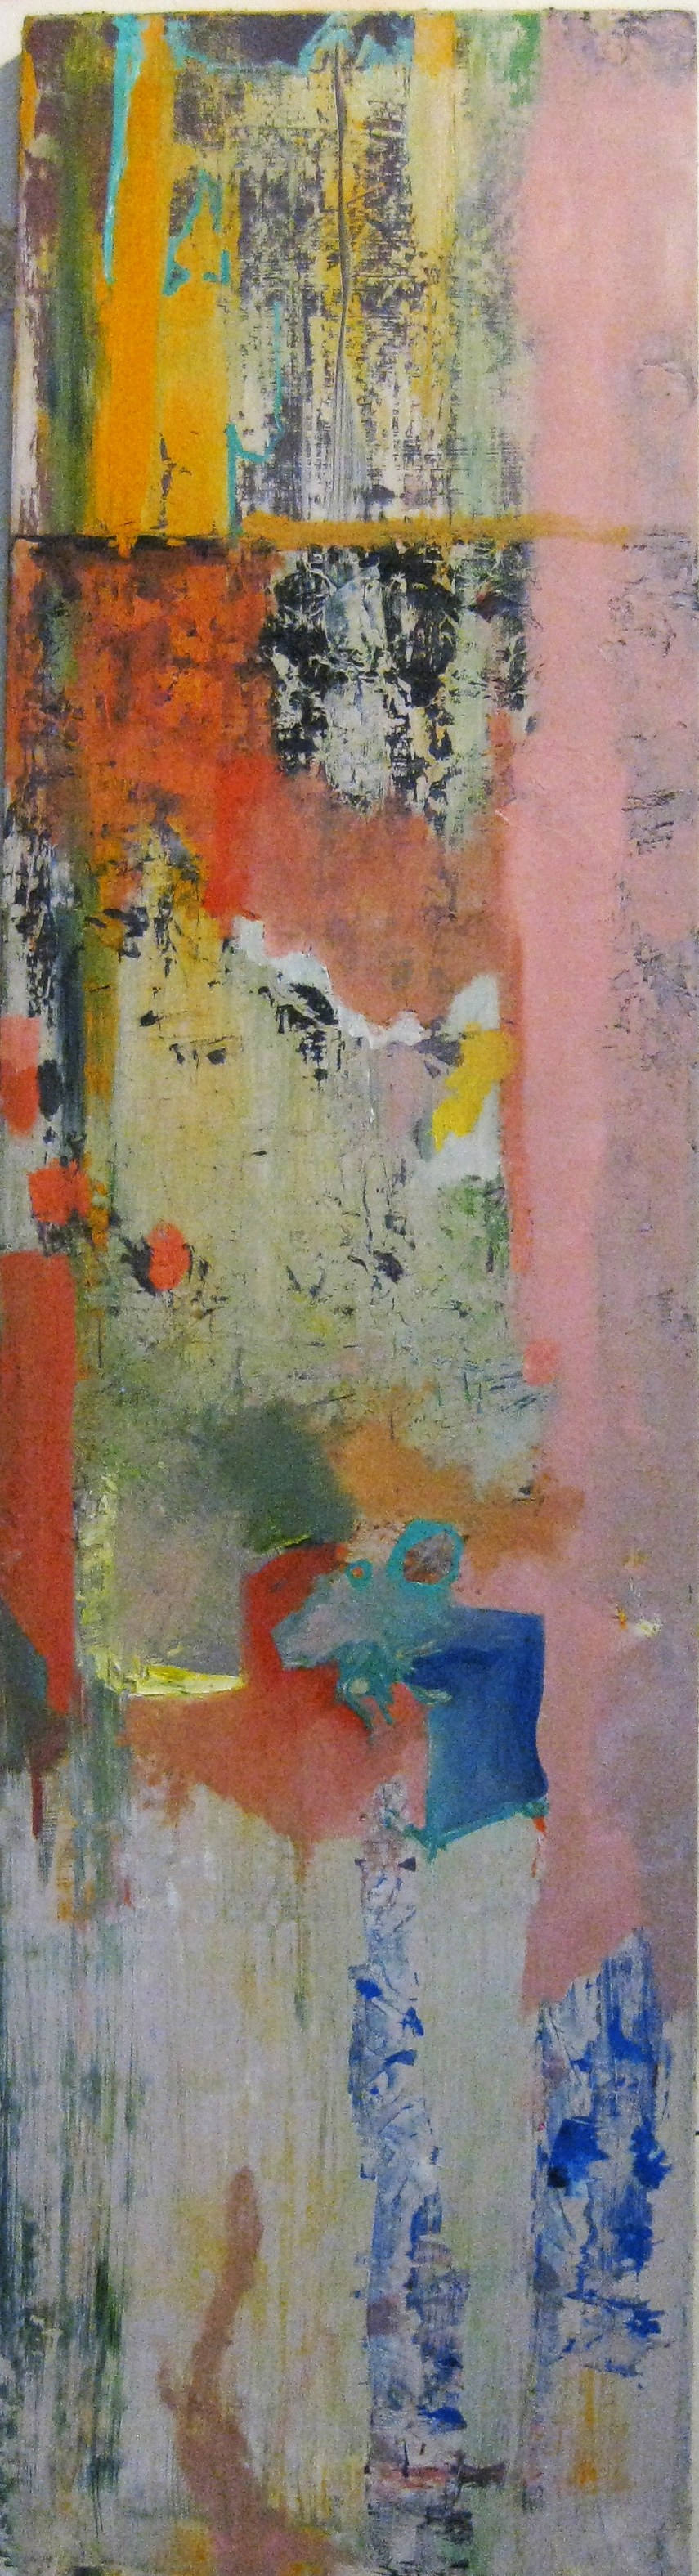 "Lies My [Art History] Teacher Told Me.   Oil on Panel  17"" x 64""  2012"